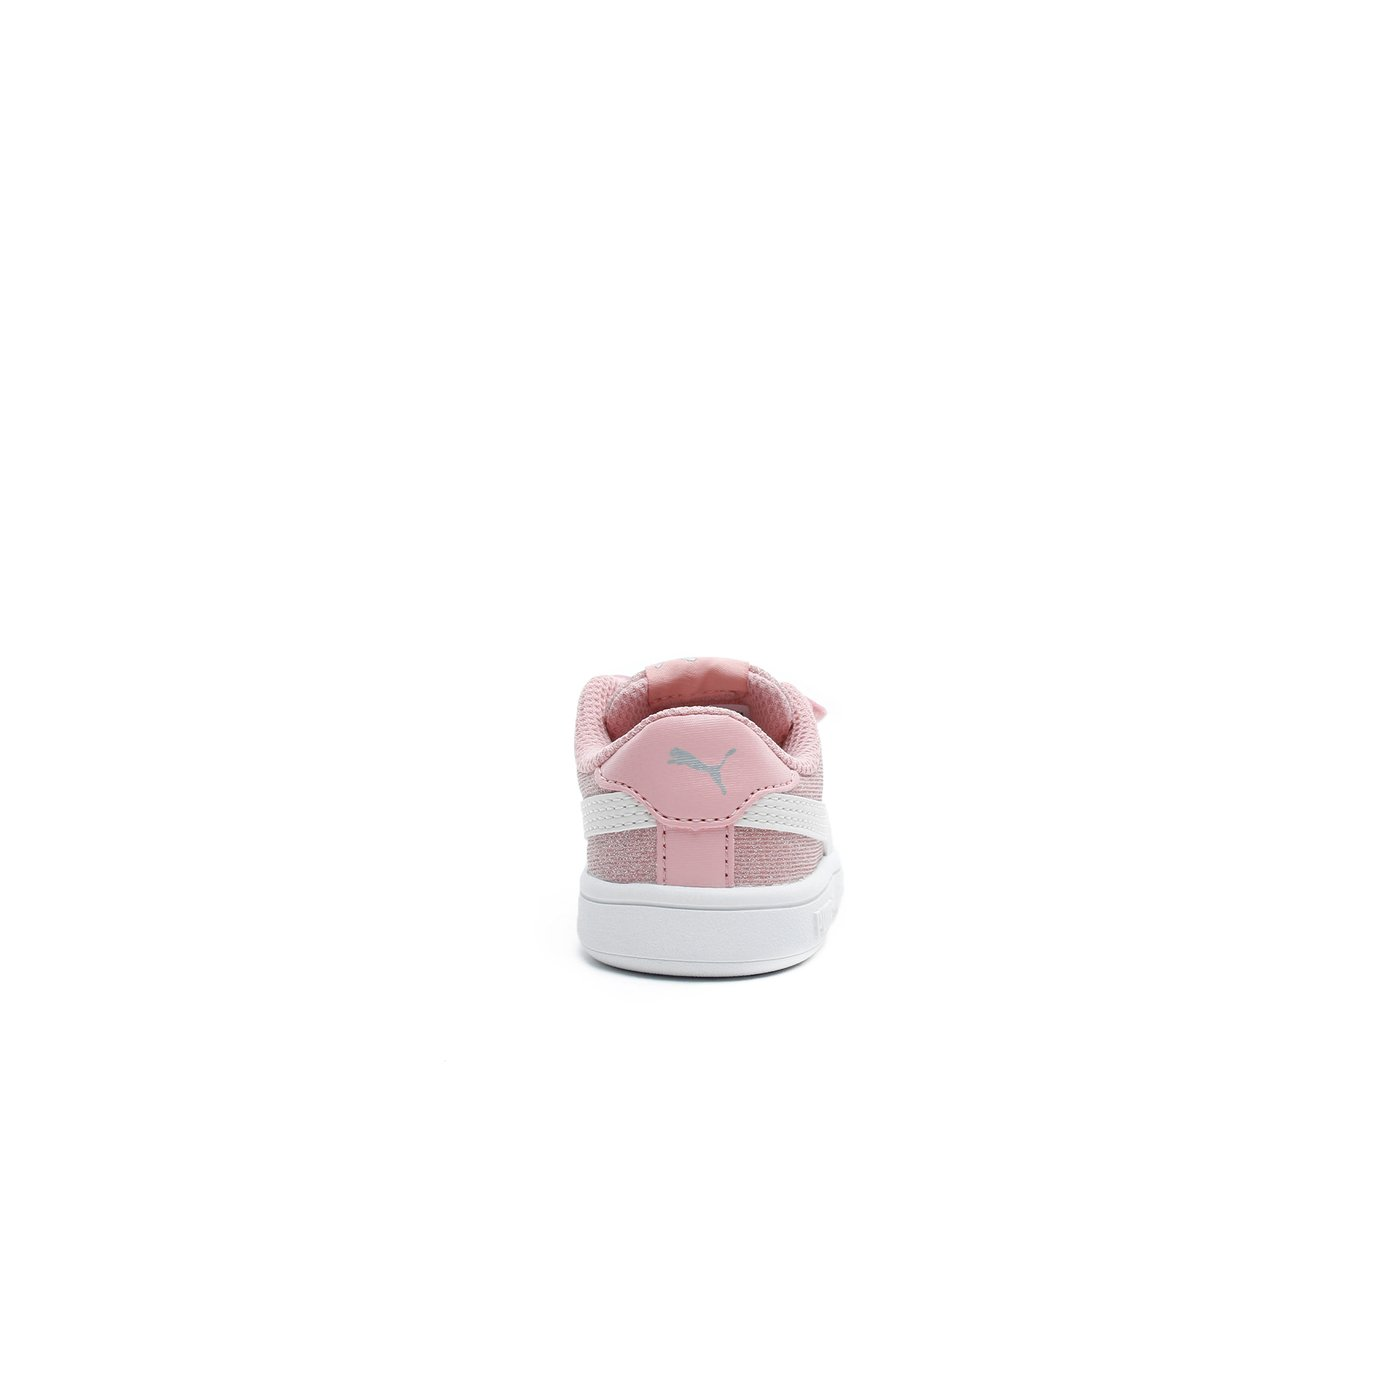 Puma Smash V2 Glitz Glam Bebek Pembe Spor Ayakkabı